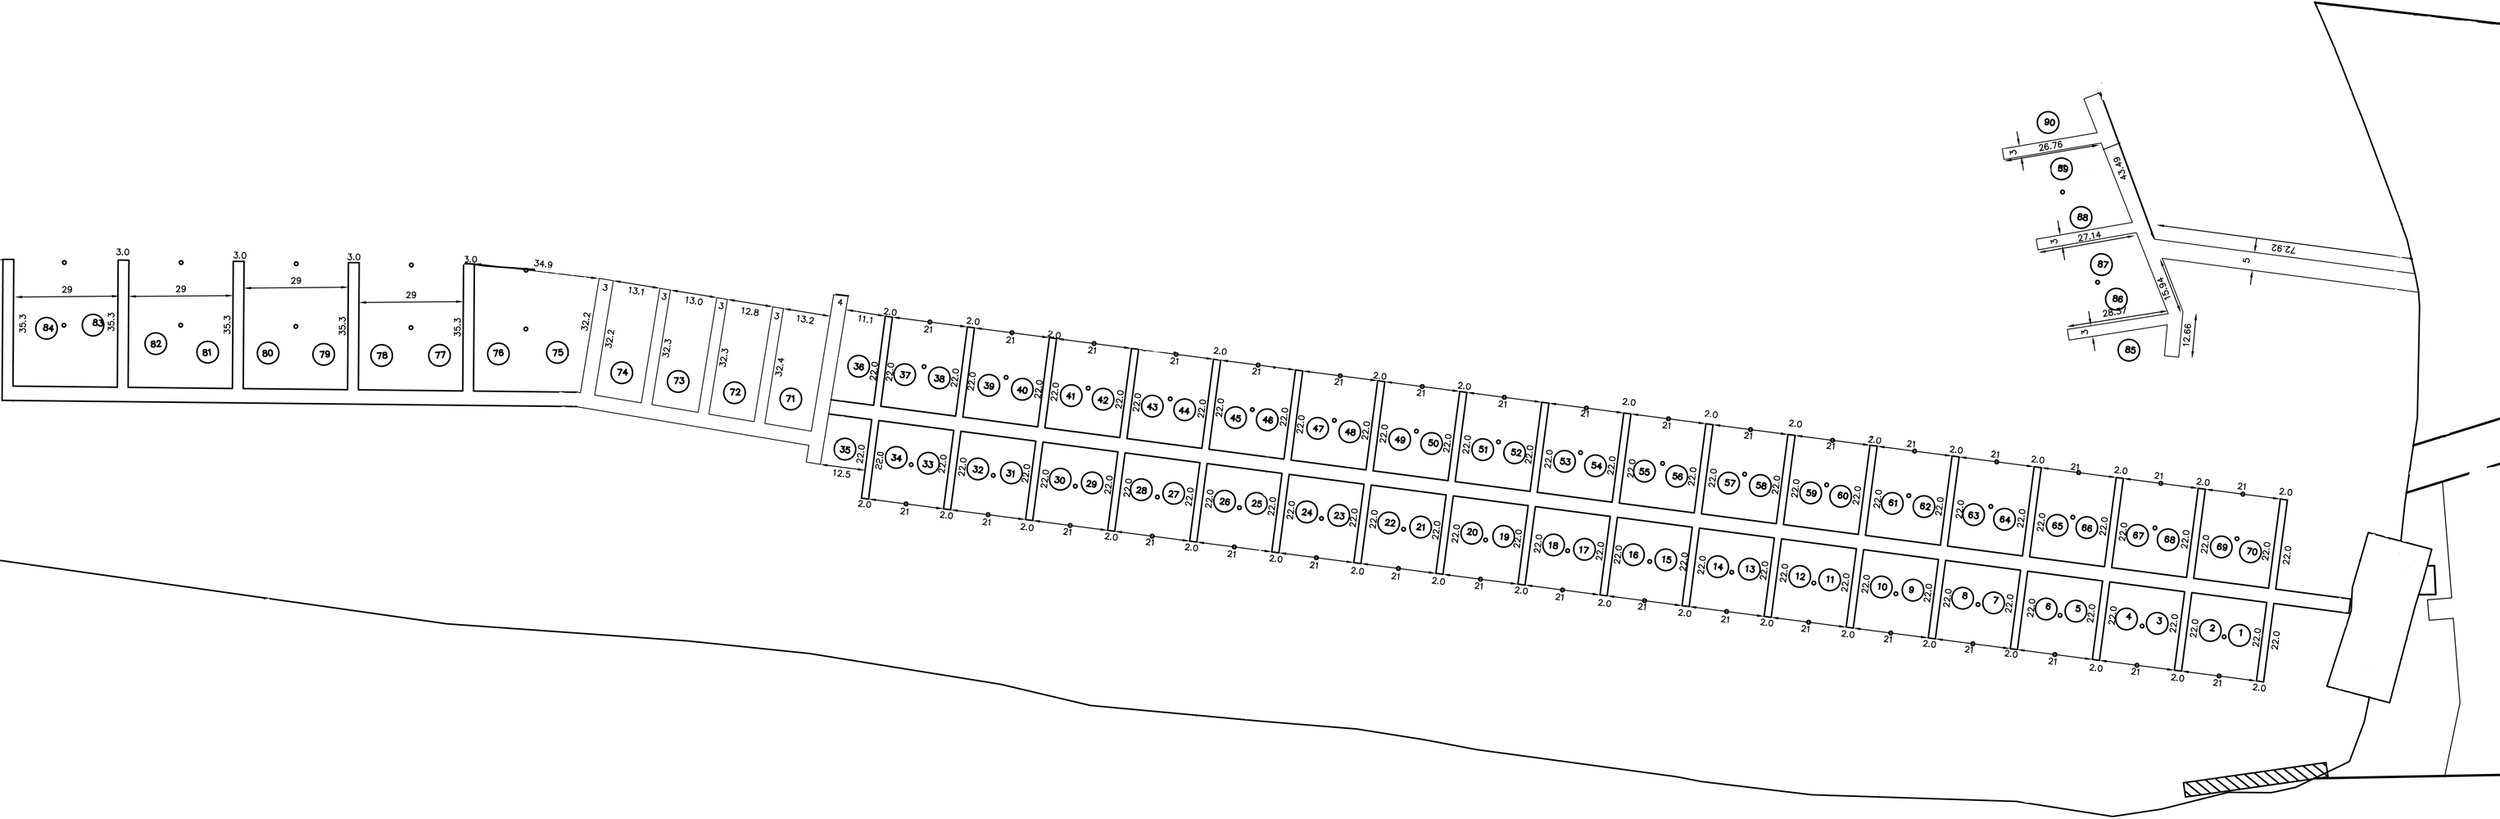 St albans bay dock map